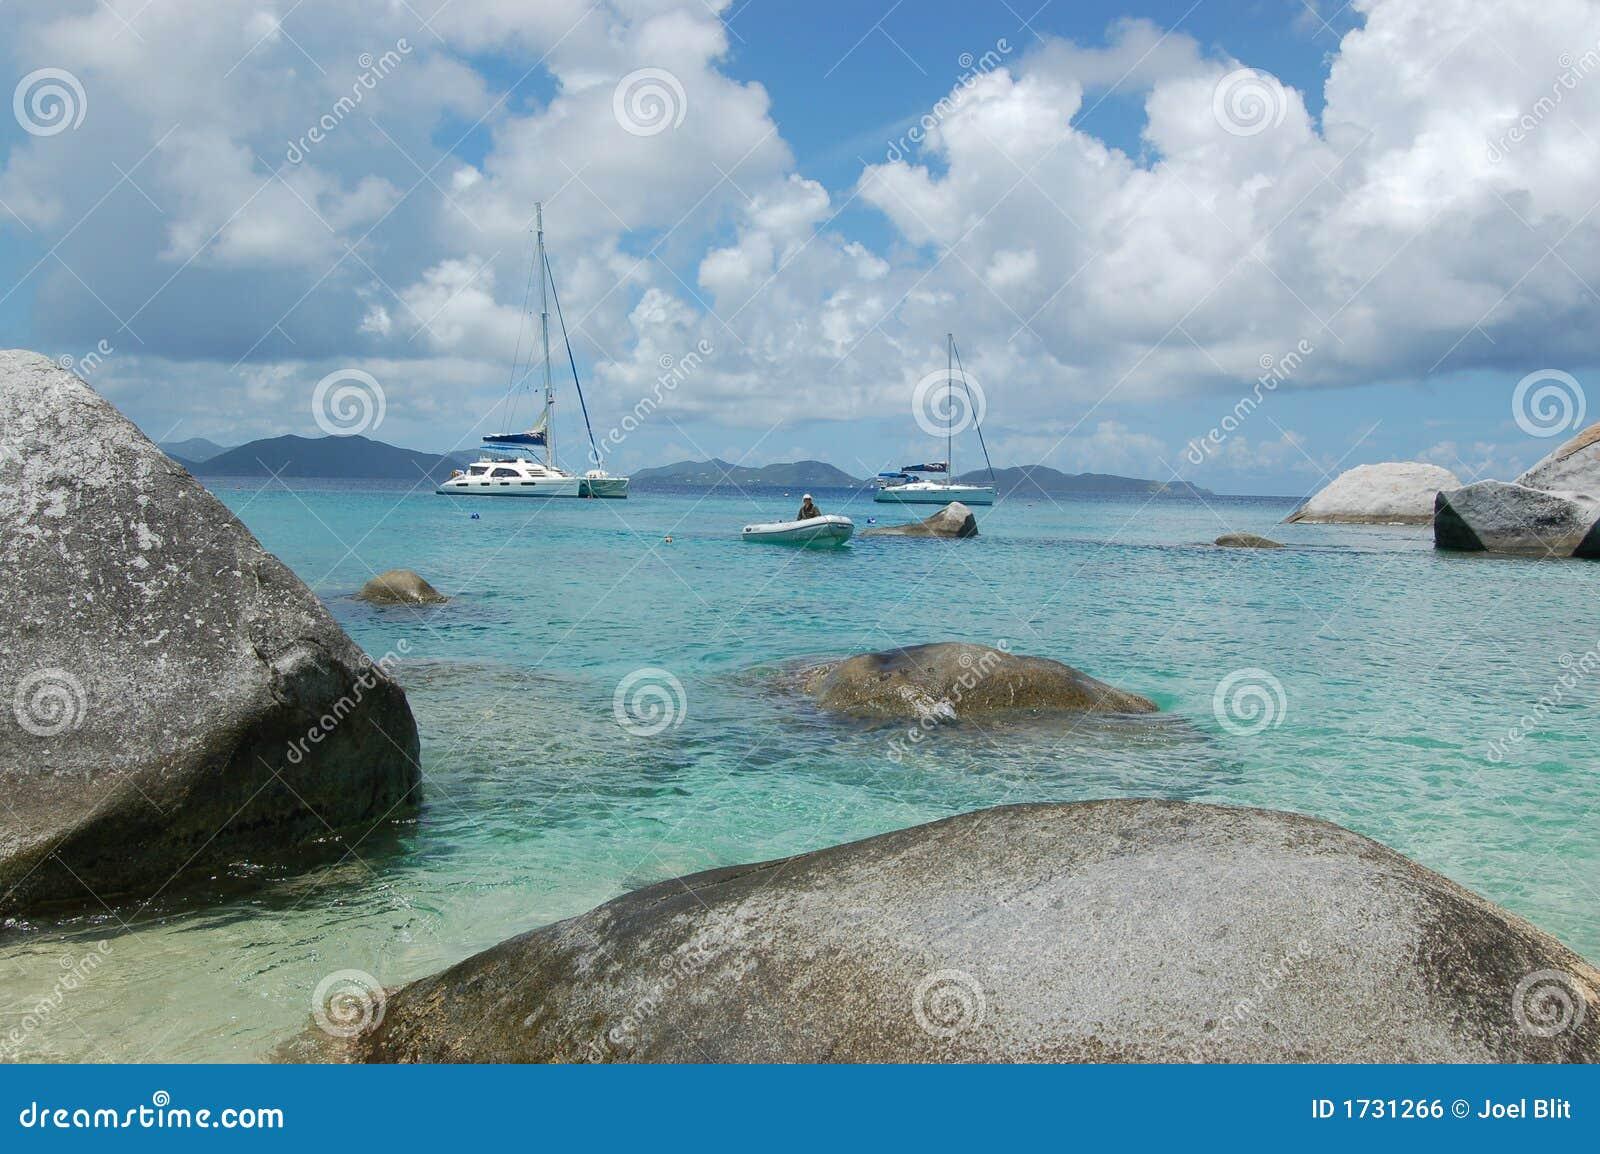 Dinghy coming into beach